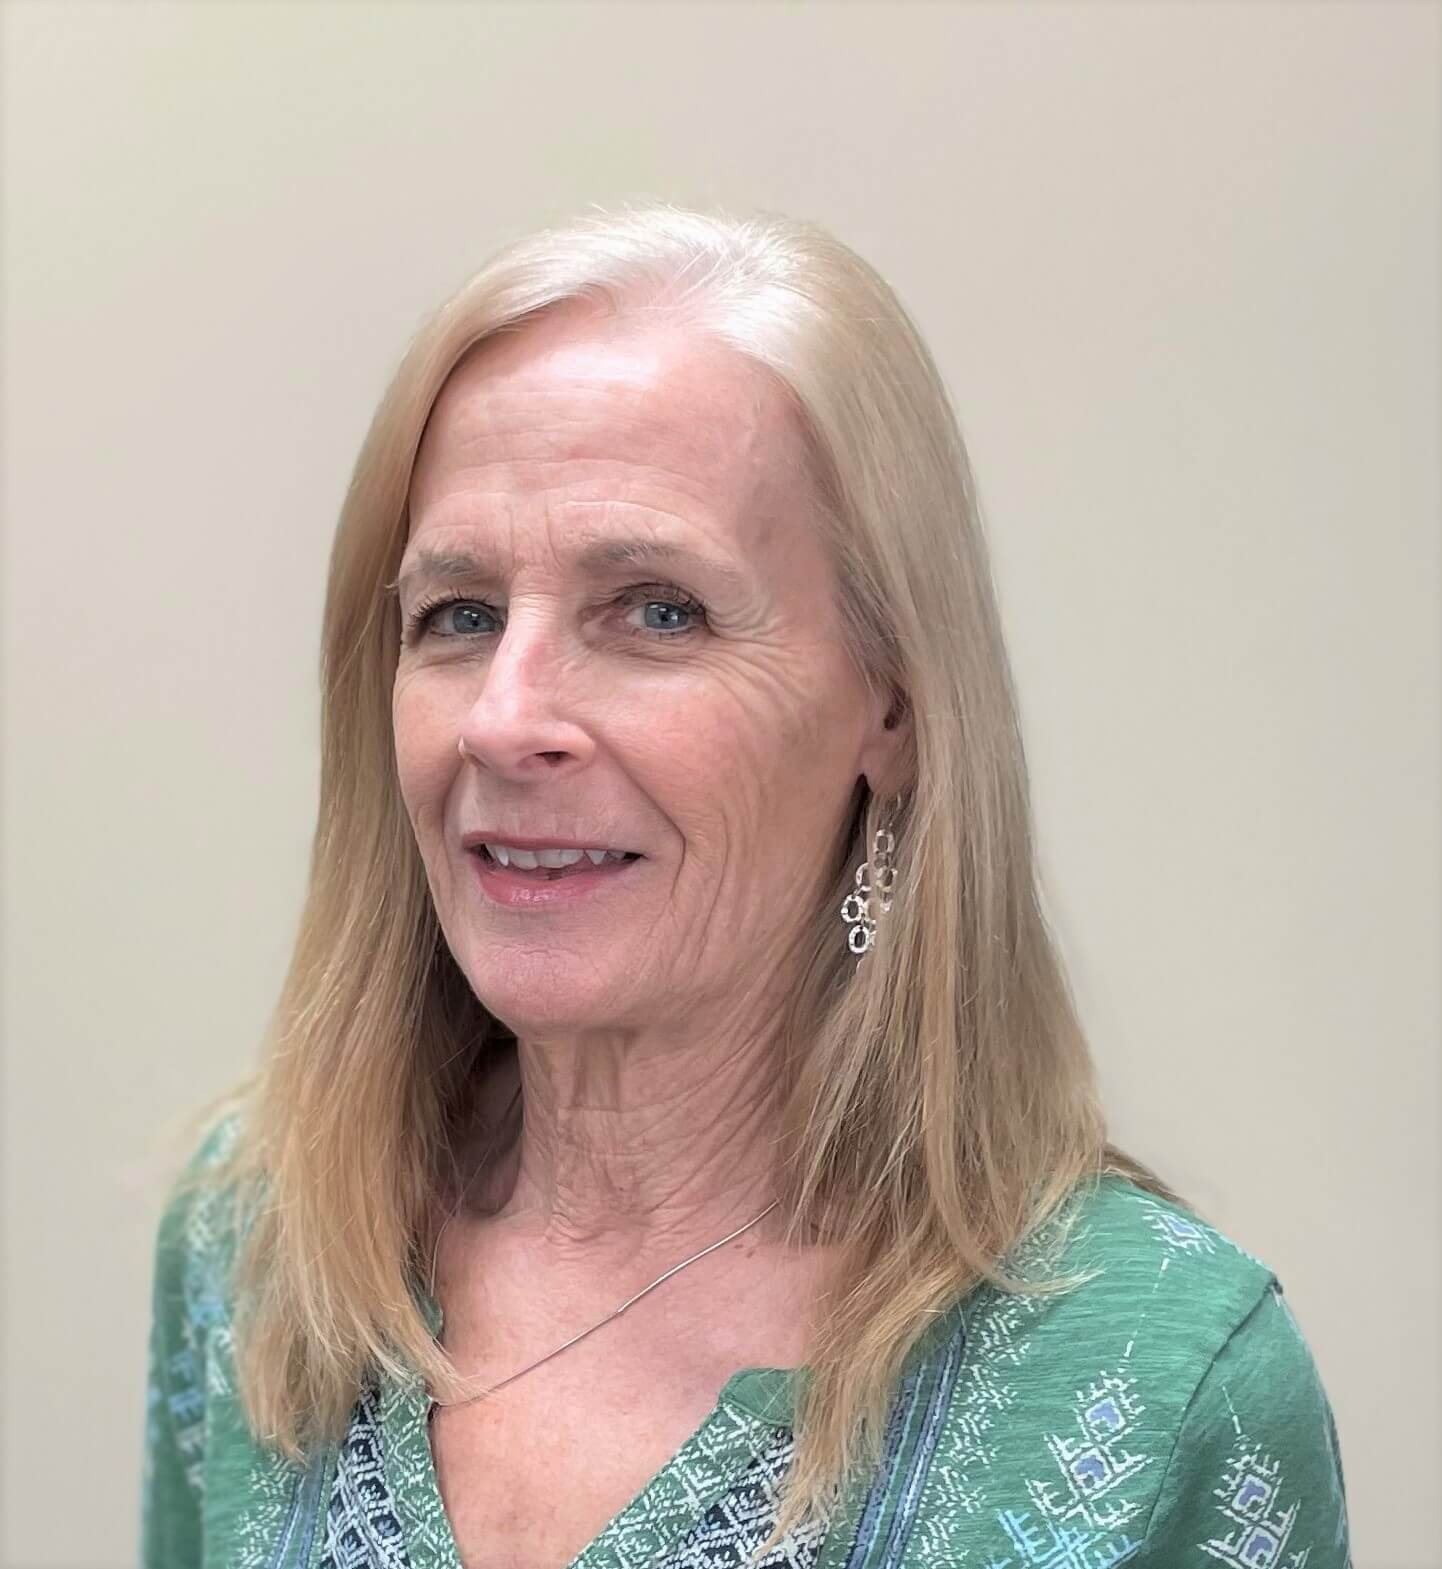 Mary Jo Villafania - Business Manager/Owner